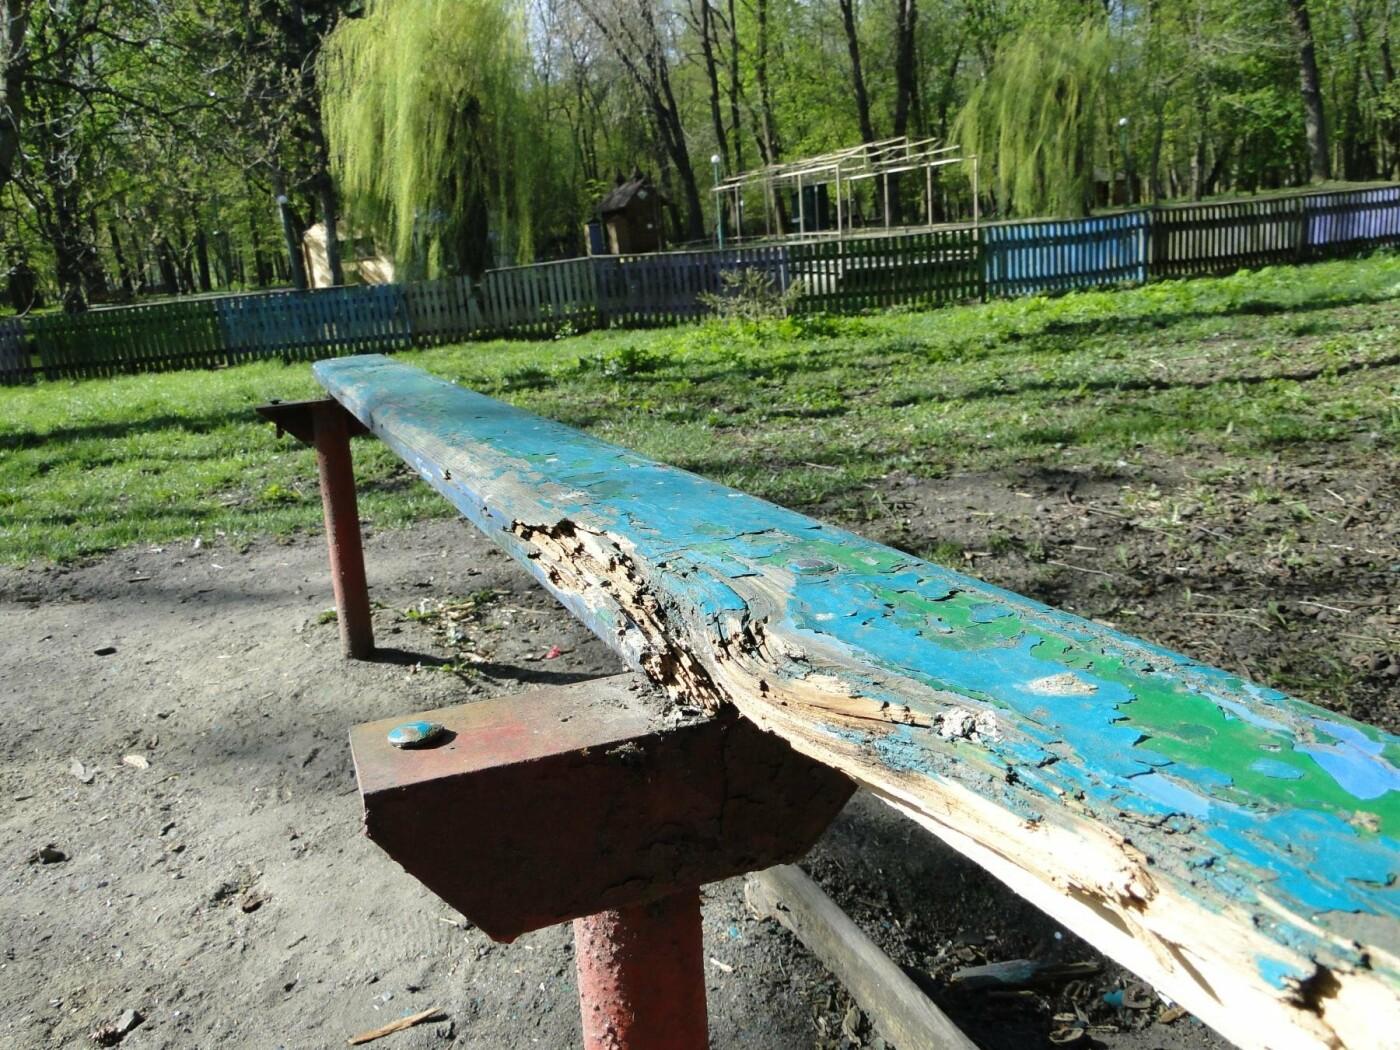 Травмоване дитинство: де зачаїлася небезпека на дитячому майданчику в парку Чекмана. ФОТО, фото-14